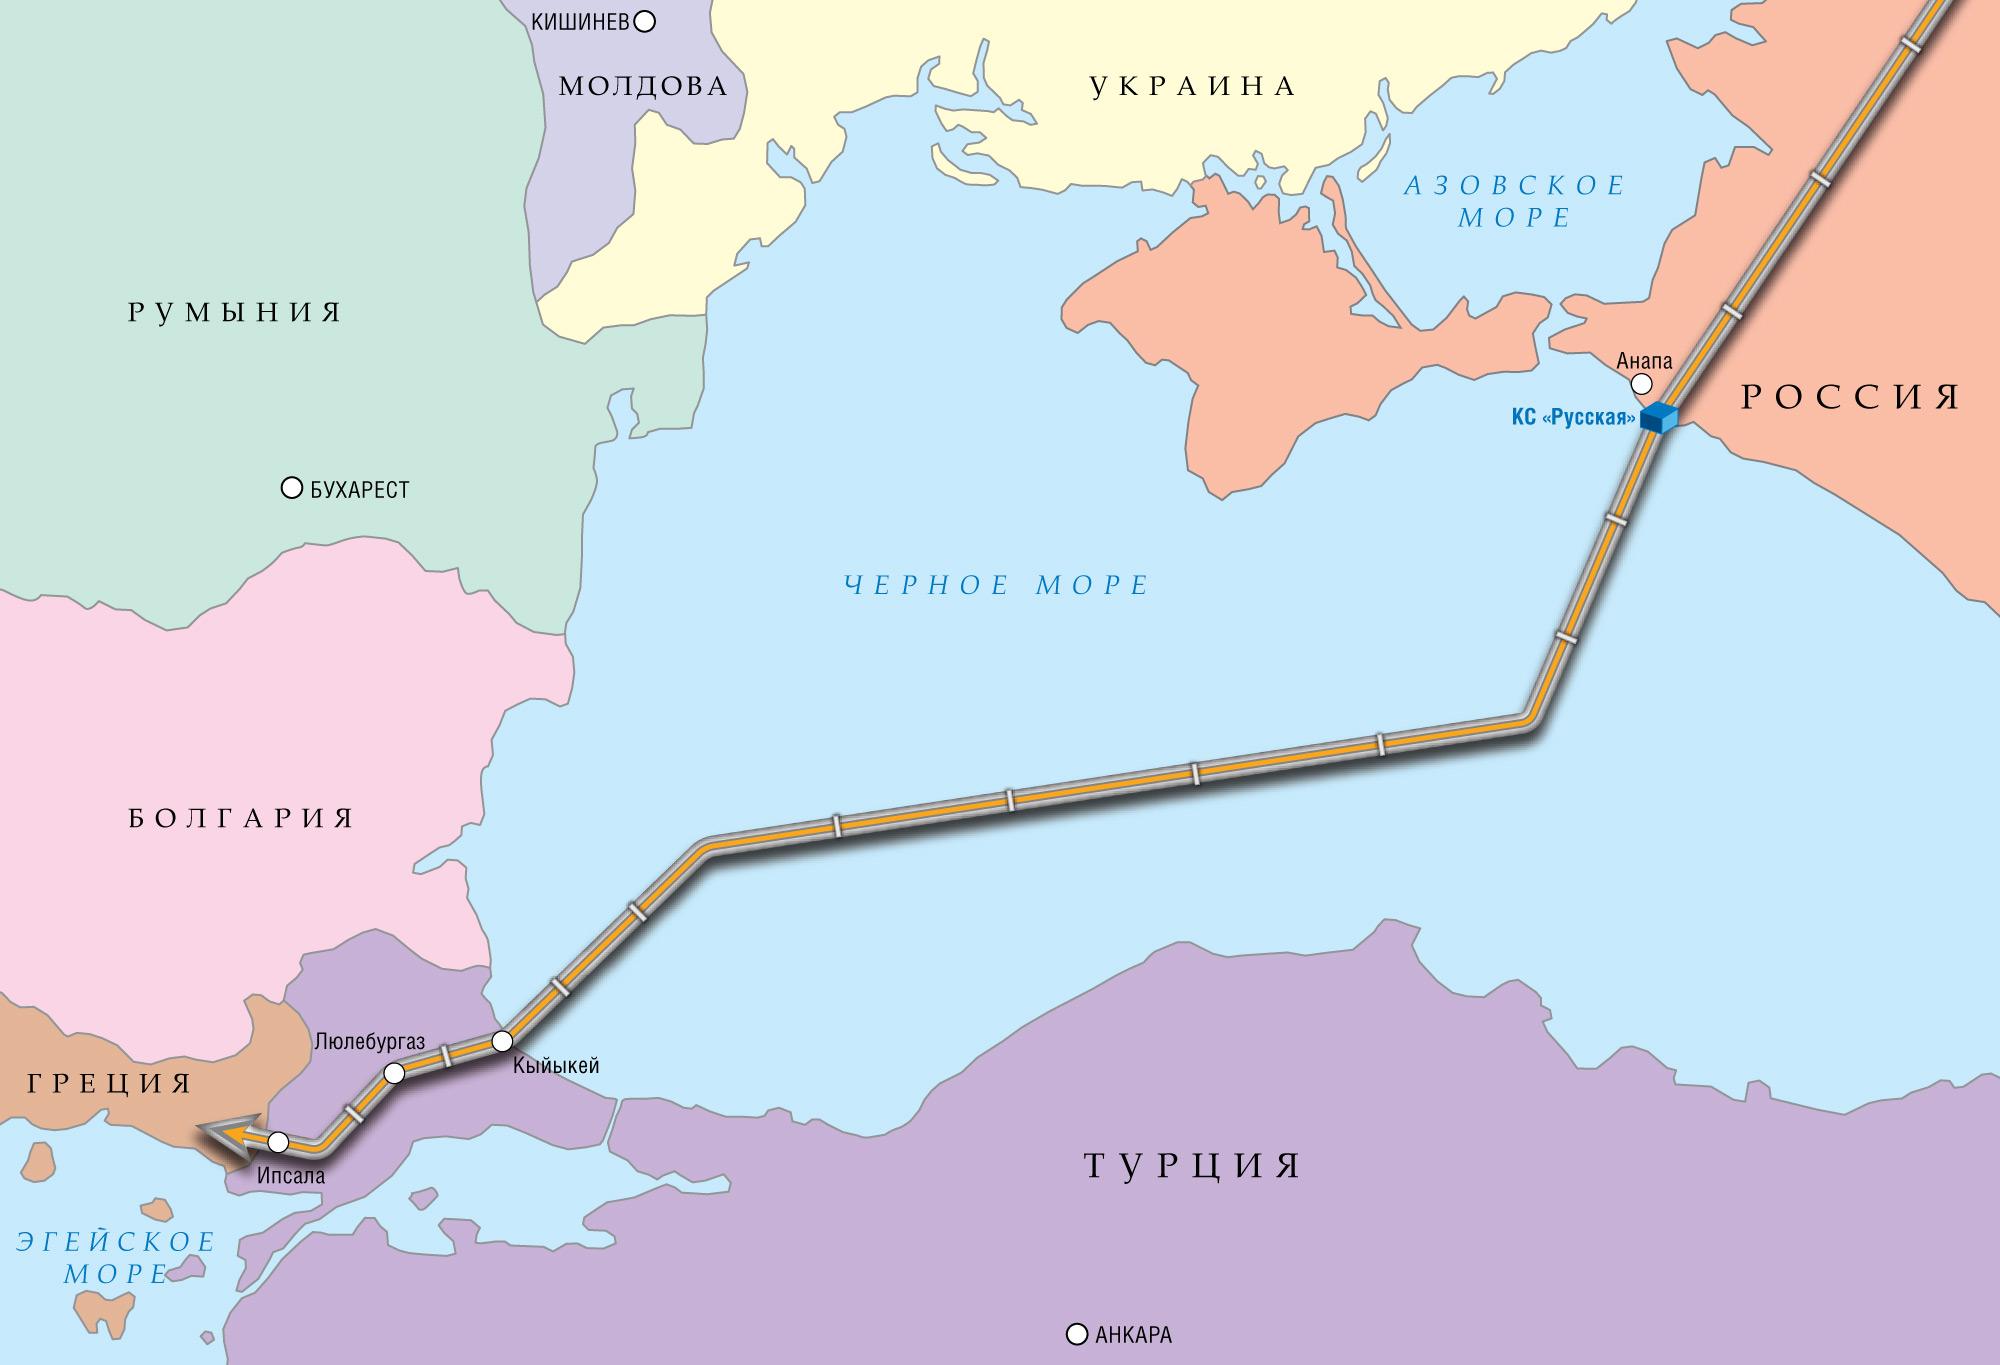 схема нефтепровода в европу